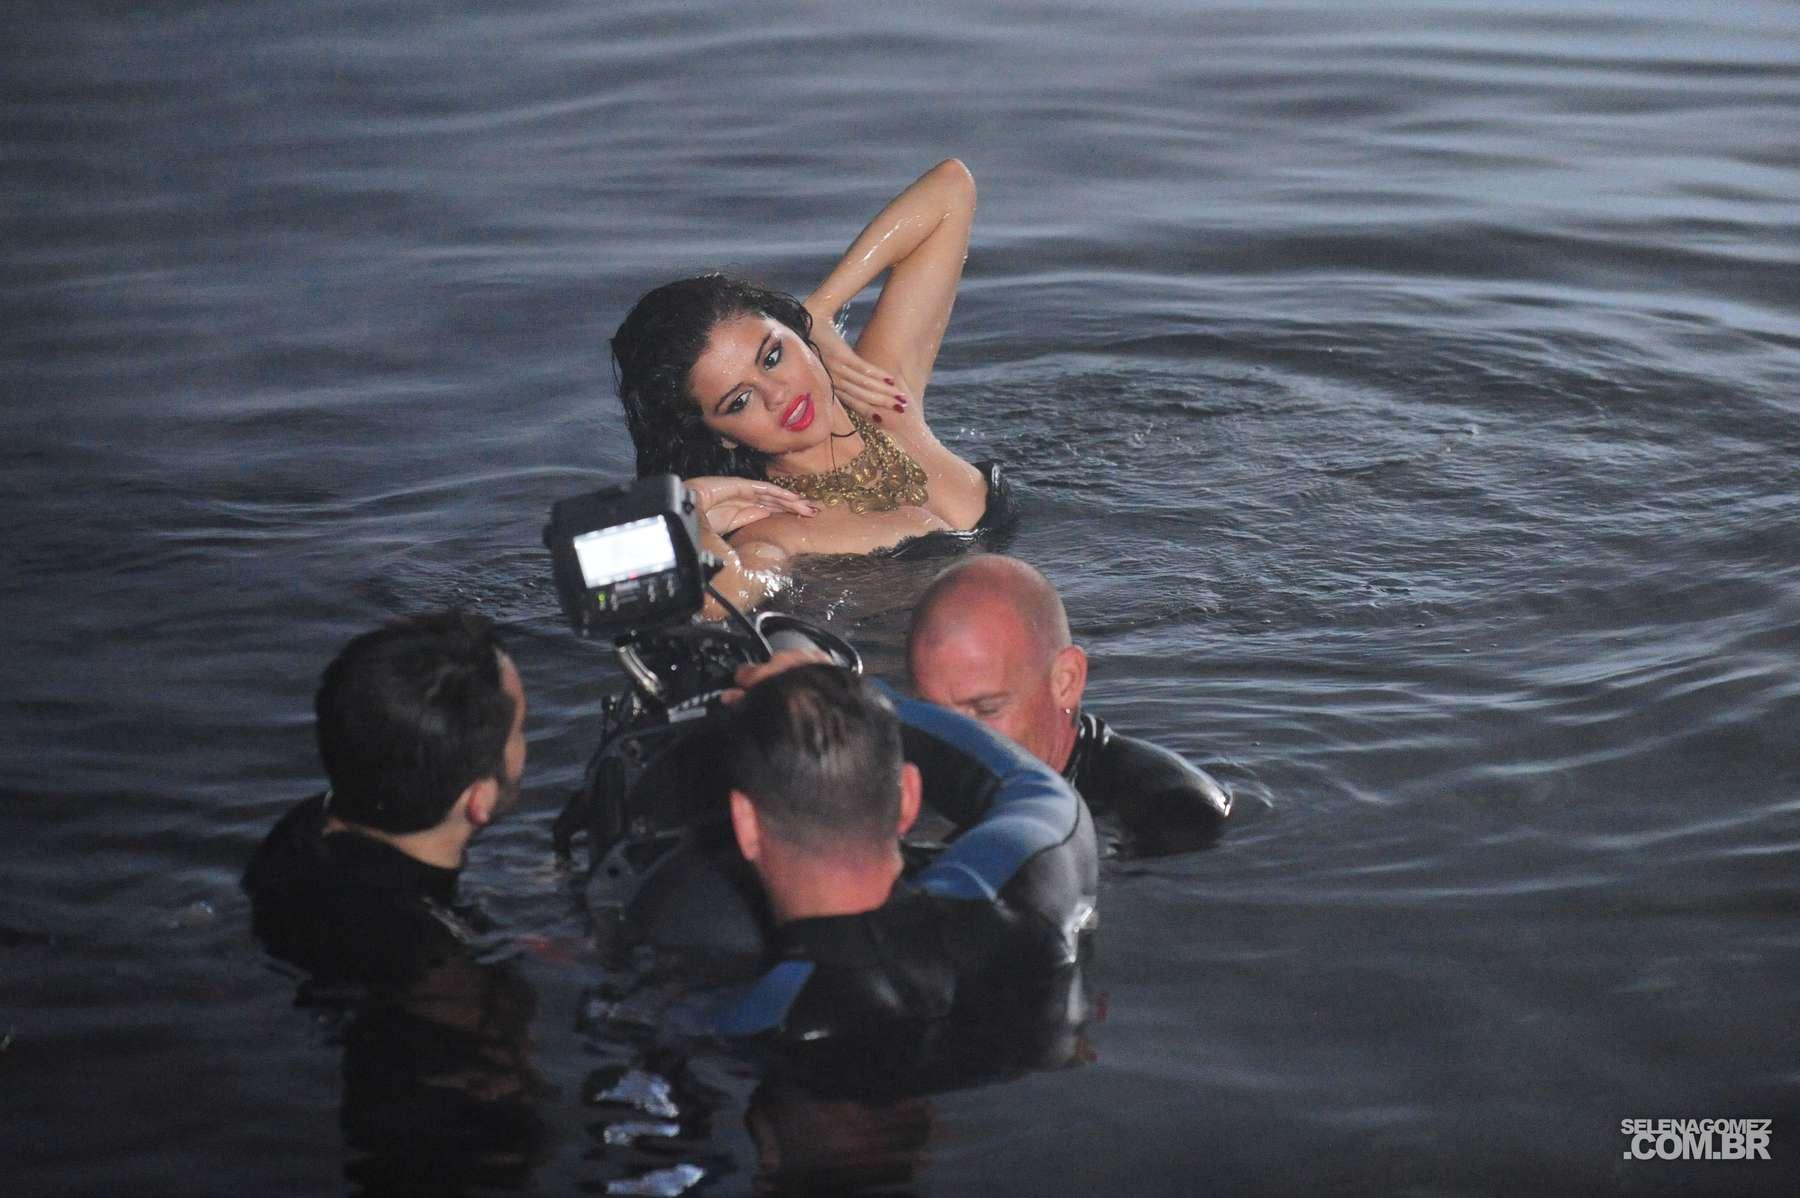 Selena Gomez 2013 : Selena Gomez – Come and Get It PhotoShot and backstage -18